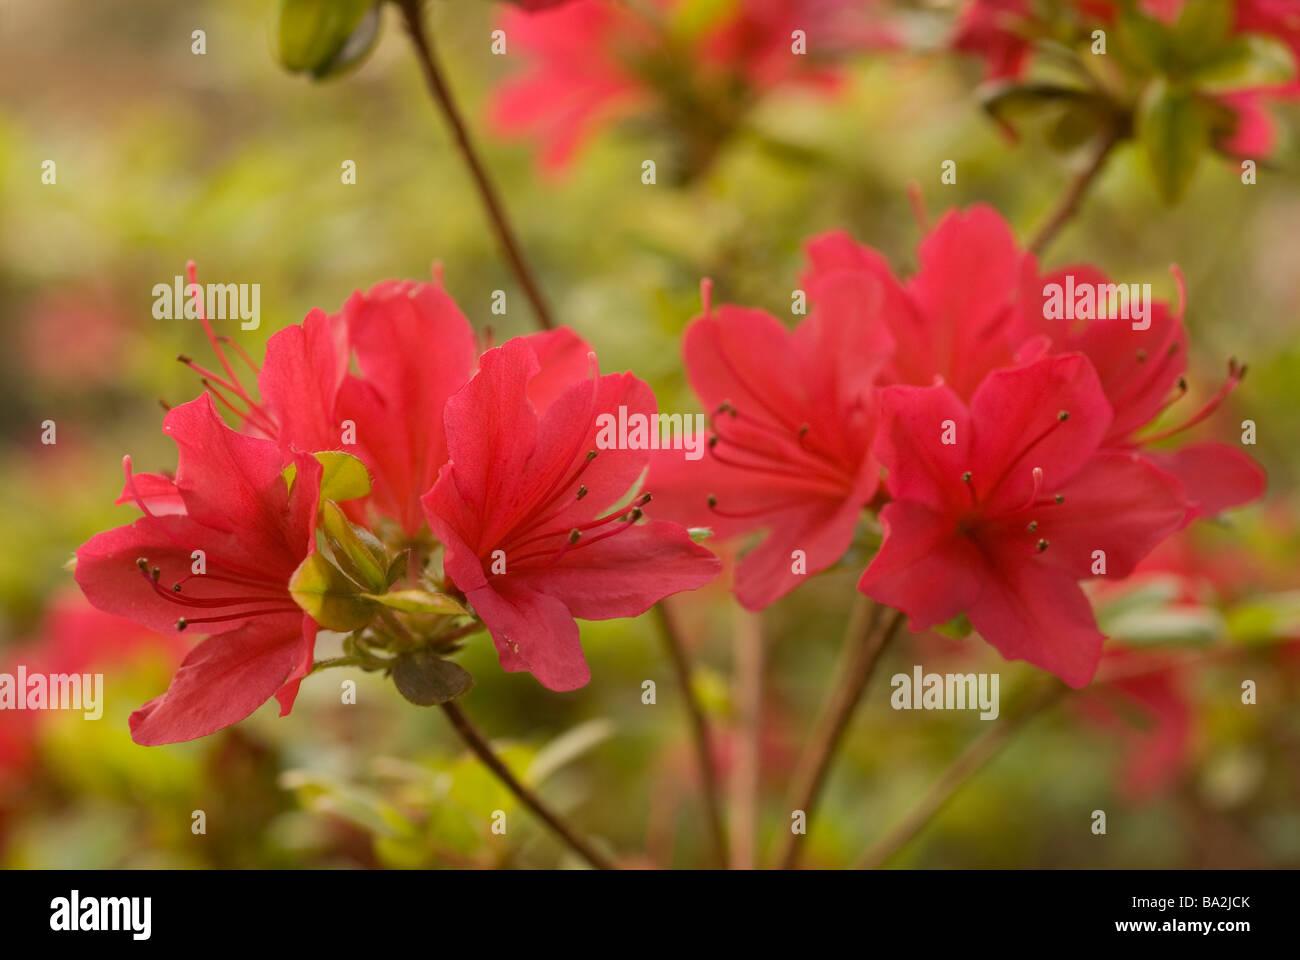 Azalea japonica (Rhododendron), Ericaceae - Stock Image